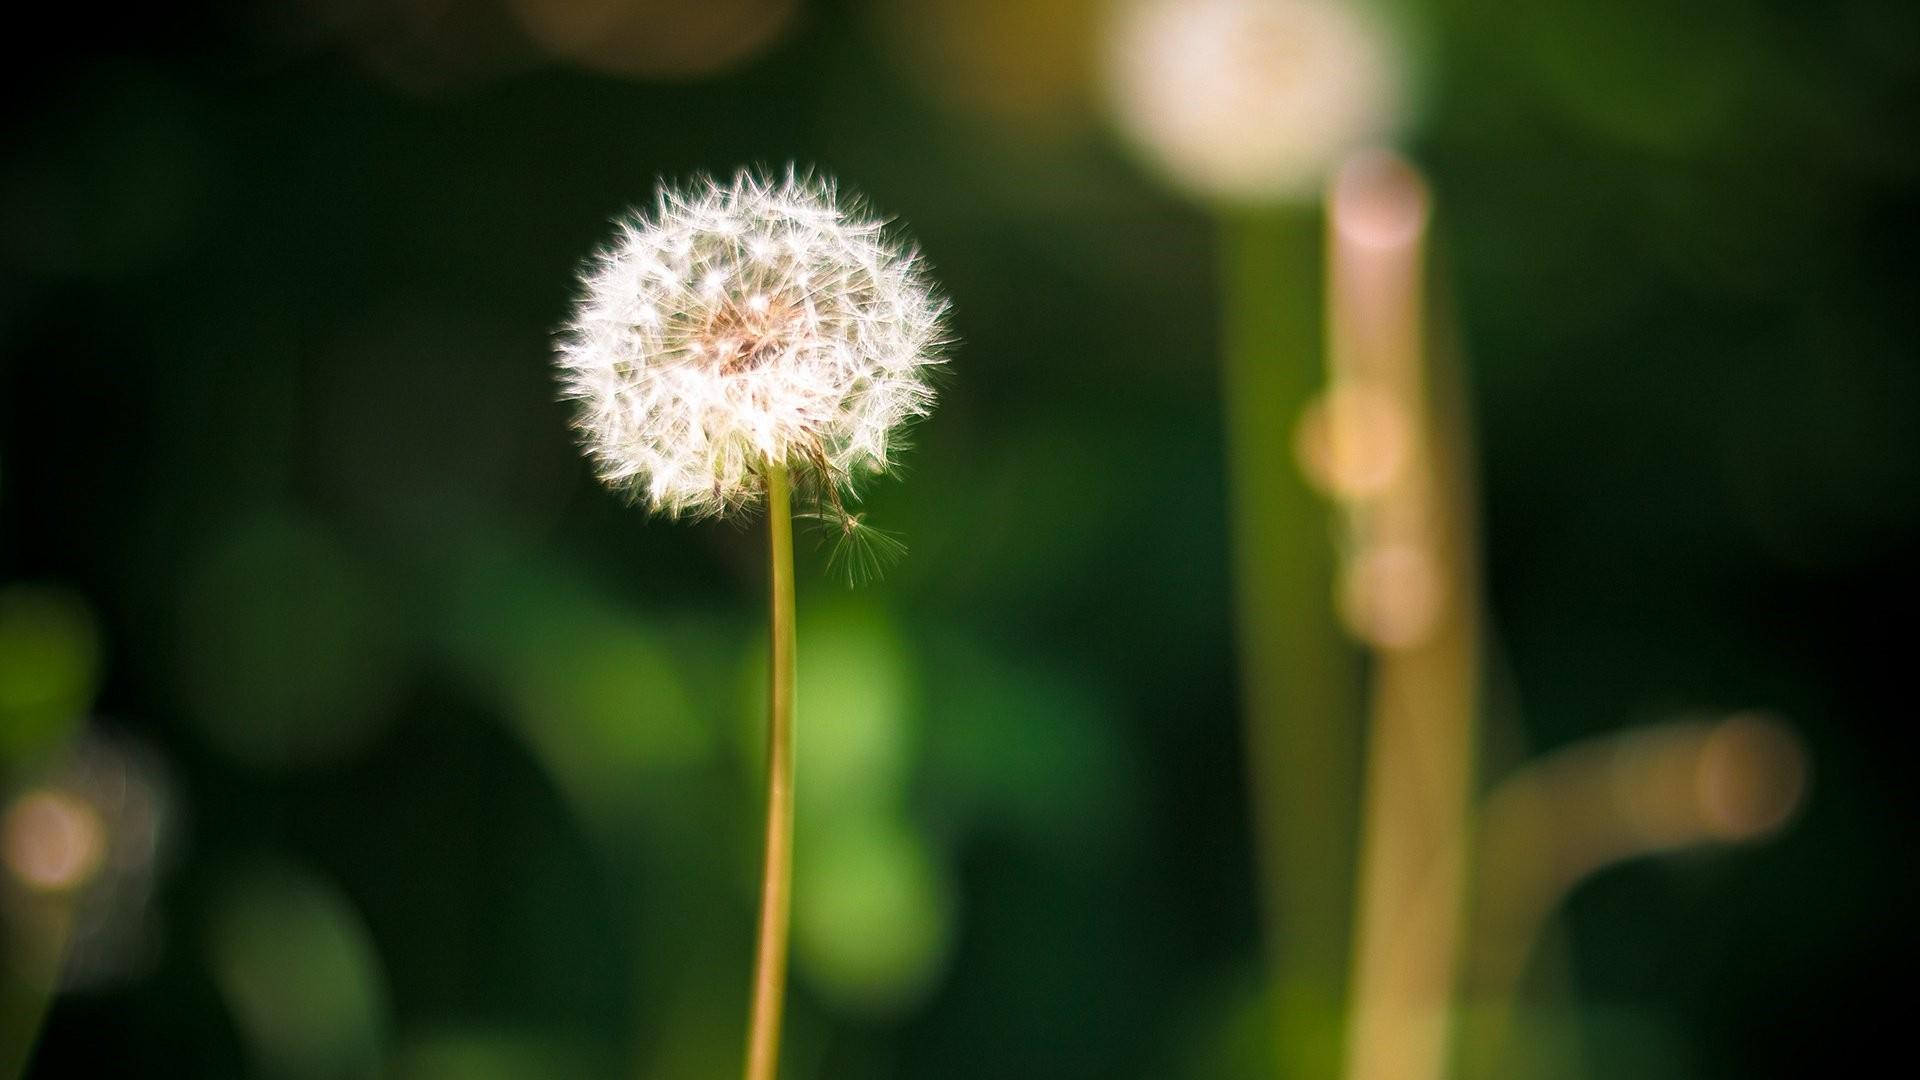 Dandelion HD Download